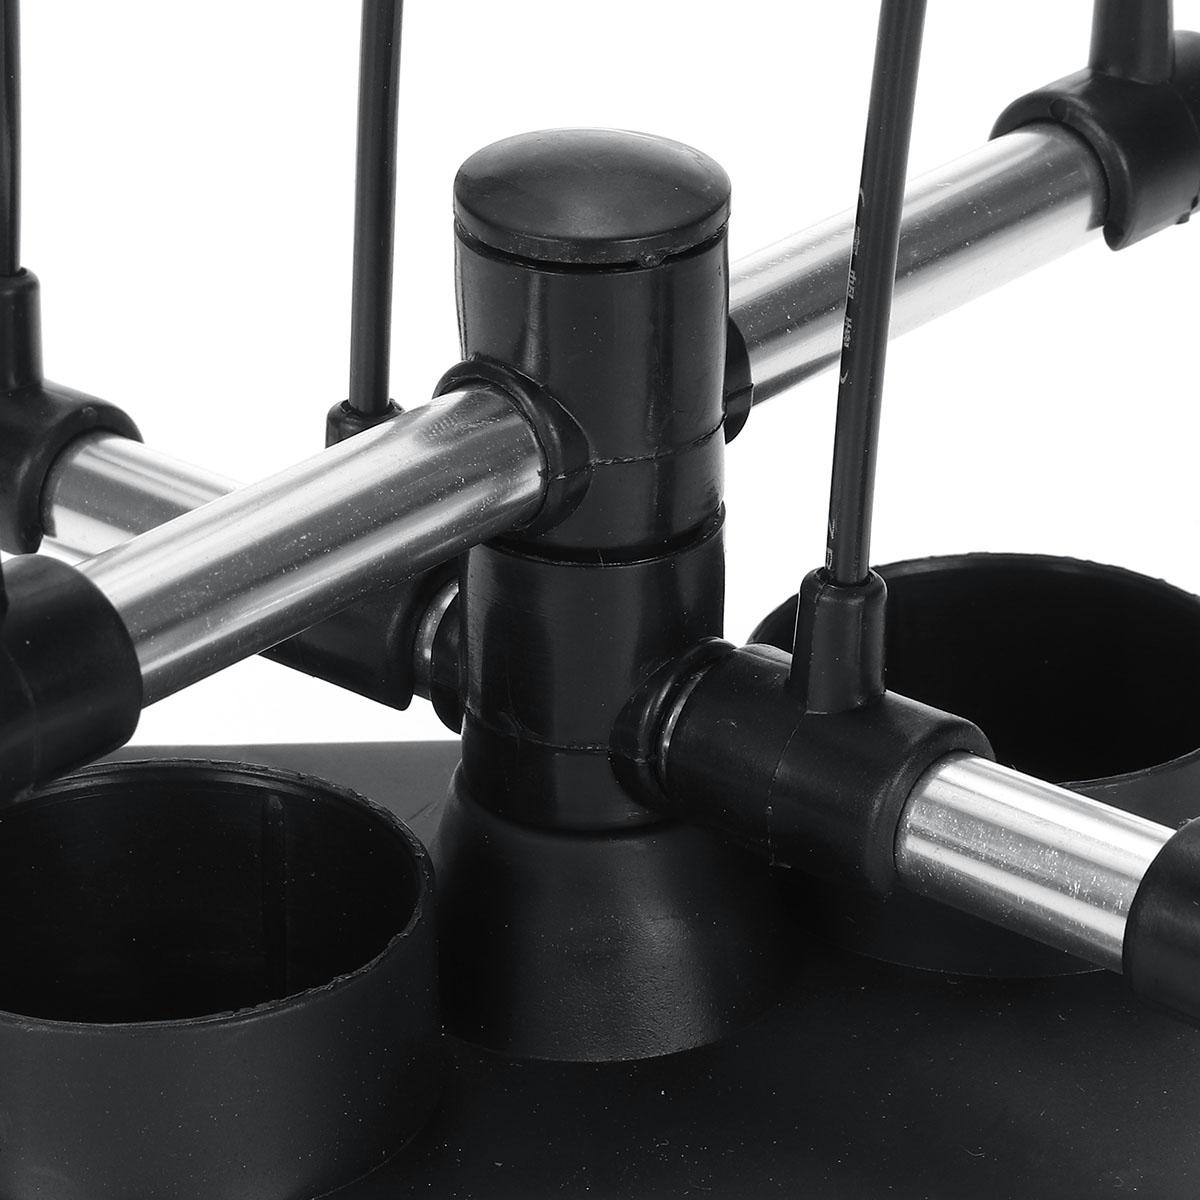 Model Spray Holder 360 Degrees Rotatable Tattoo Airbrush Stand Art Tools Kit